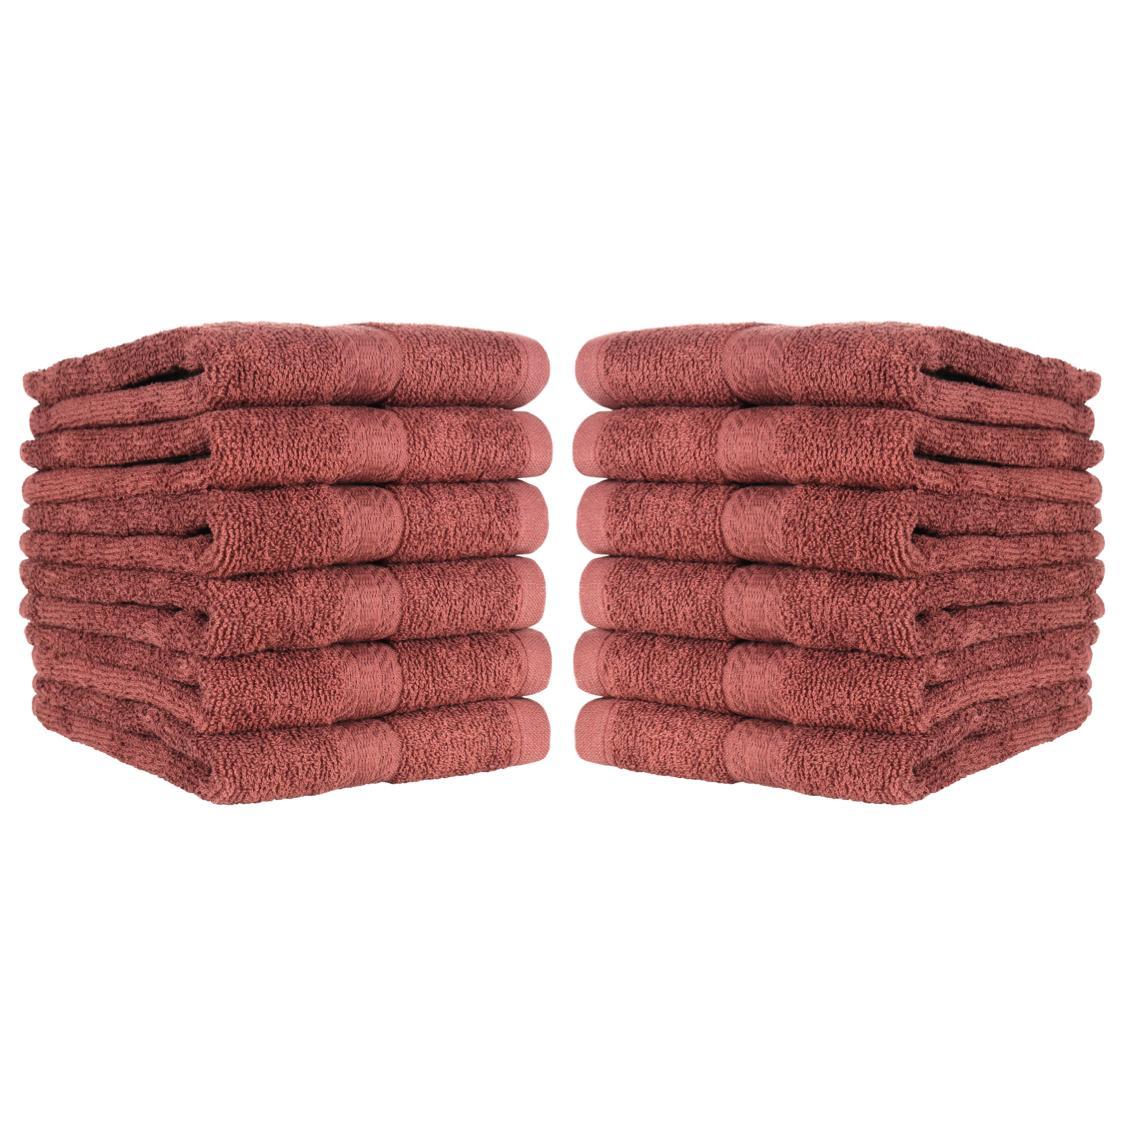 12 of Bathroom Hand Ring-Spun Cotton 16 27